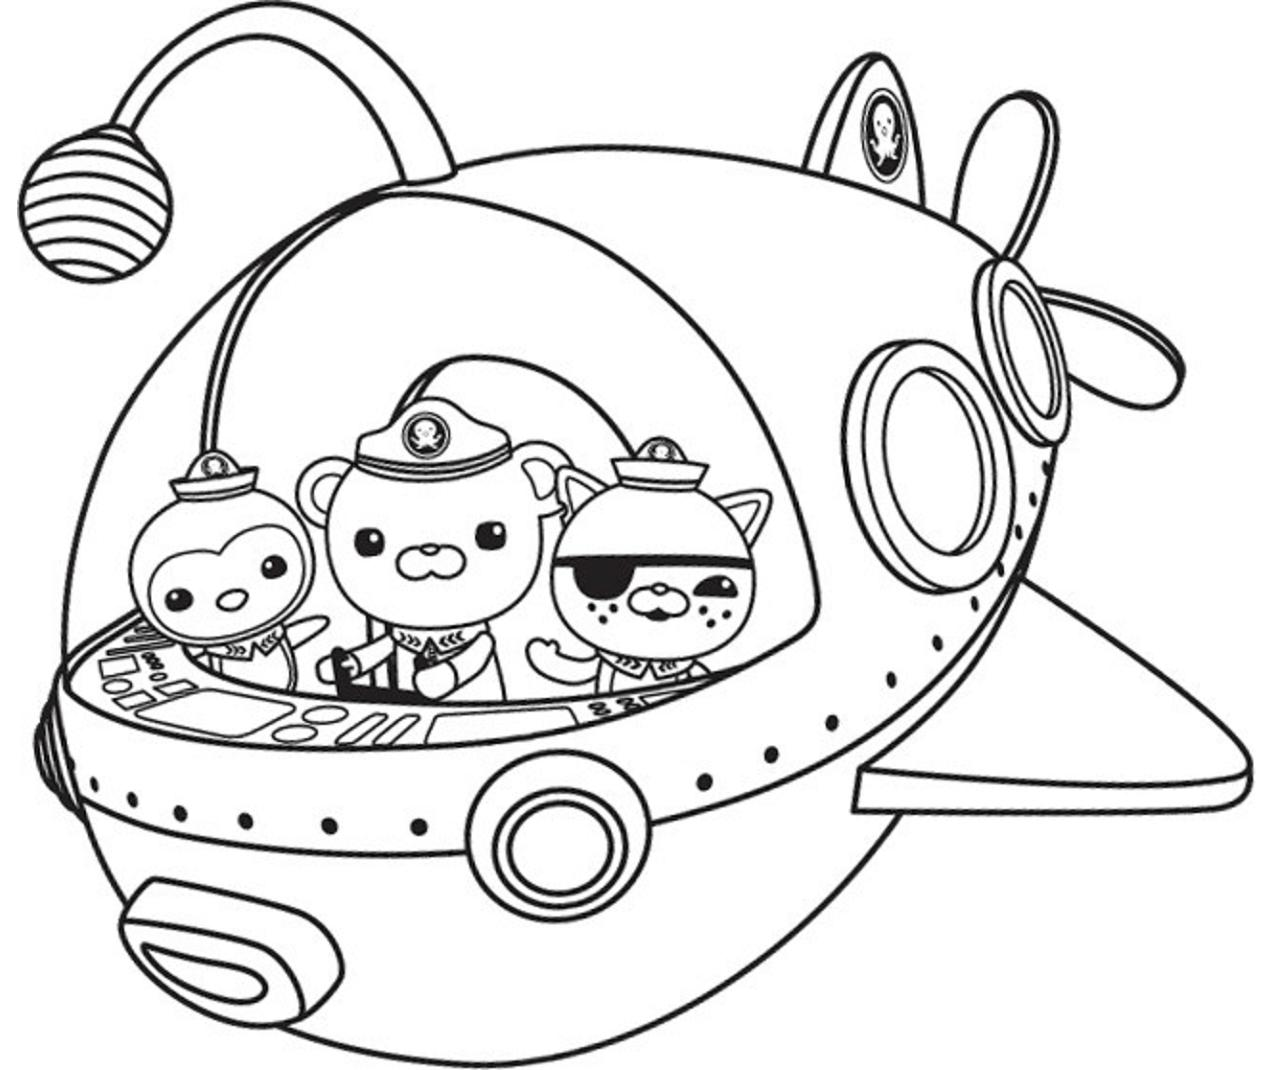 Peso, Captain, Kwazii In Octonauts Ship